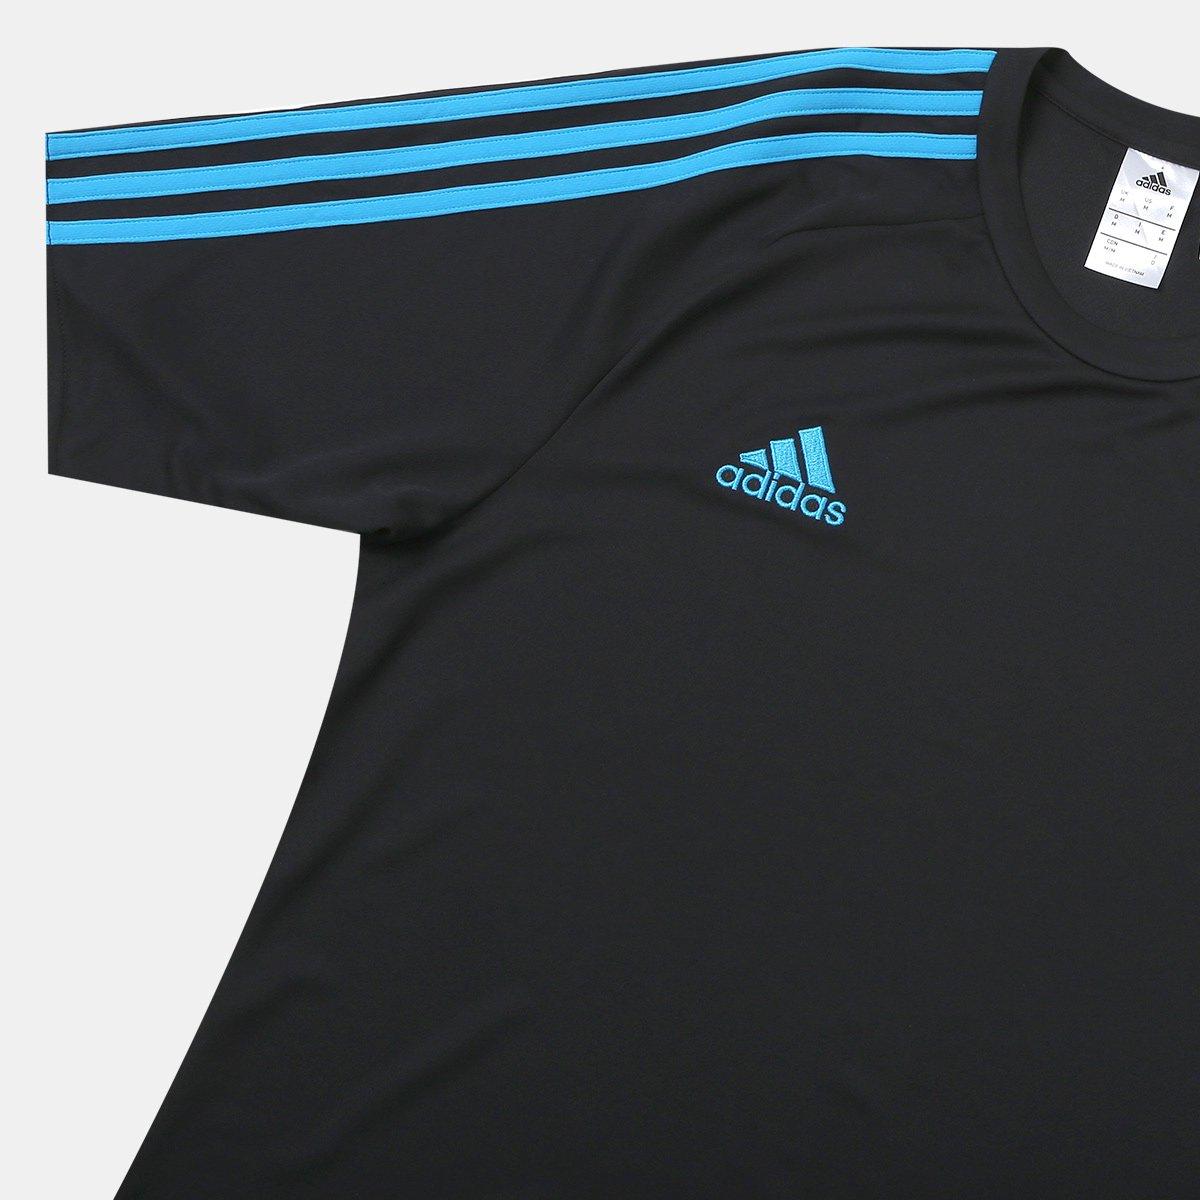 642eea13d9 Camisa Adidas Estro 15 Masculina - Preto e Azul Turquesa - Compre ...